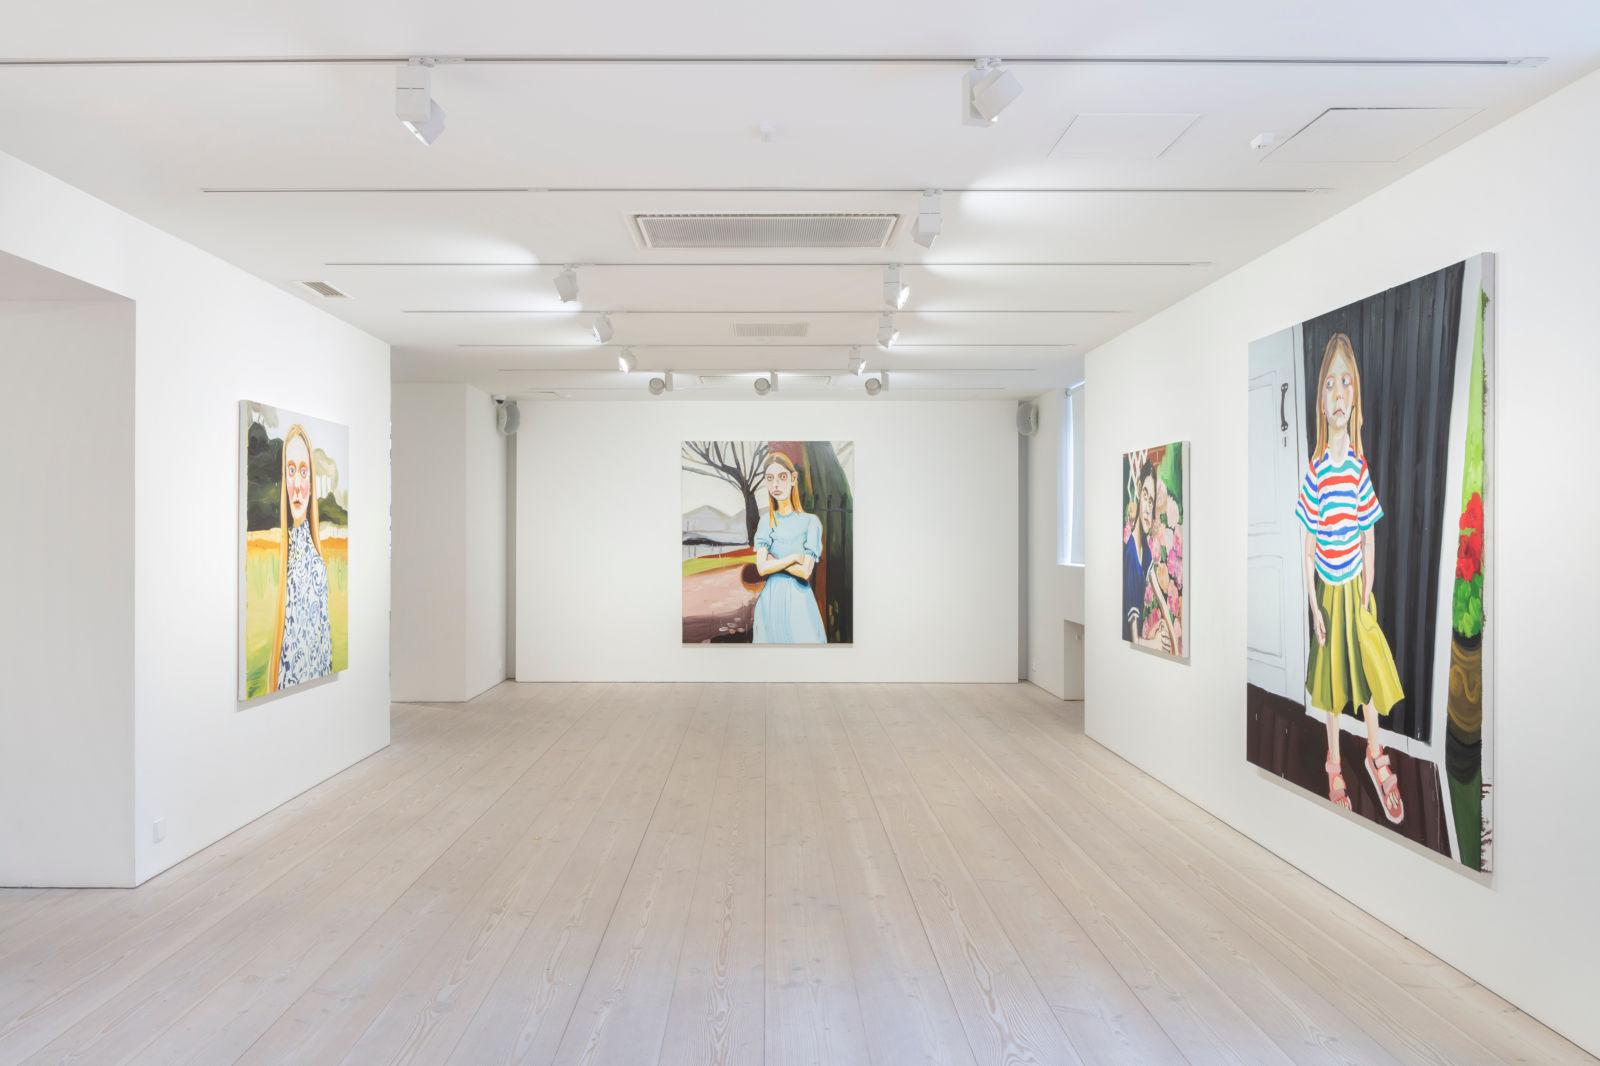 Galerie Forsblom Jenni Hiltunen 1